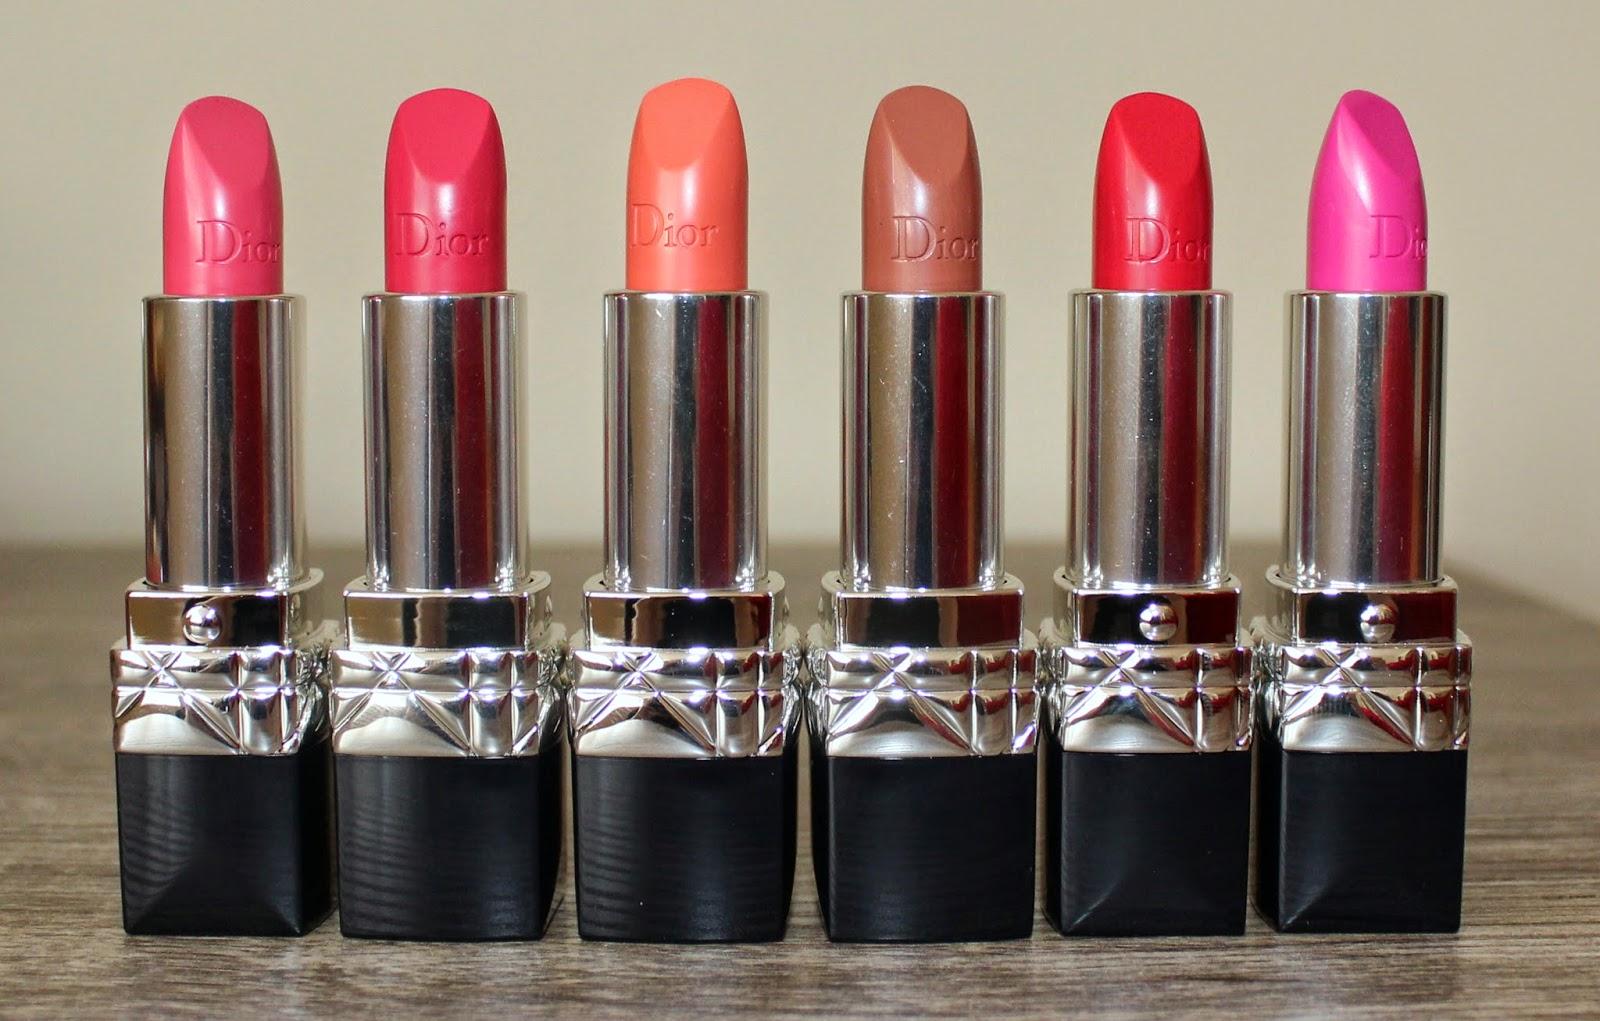 2a9aefda Dior Rouge Lipstick Photo Album - Orapack